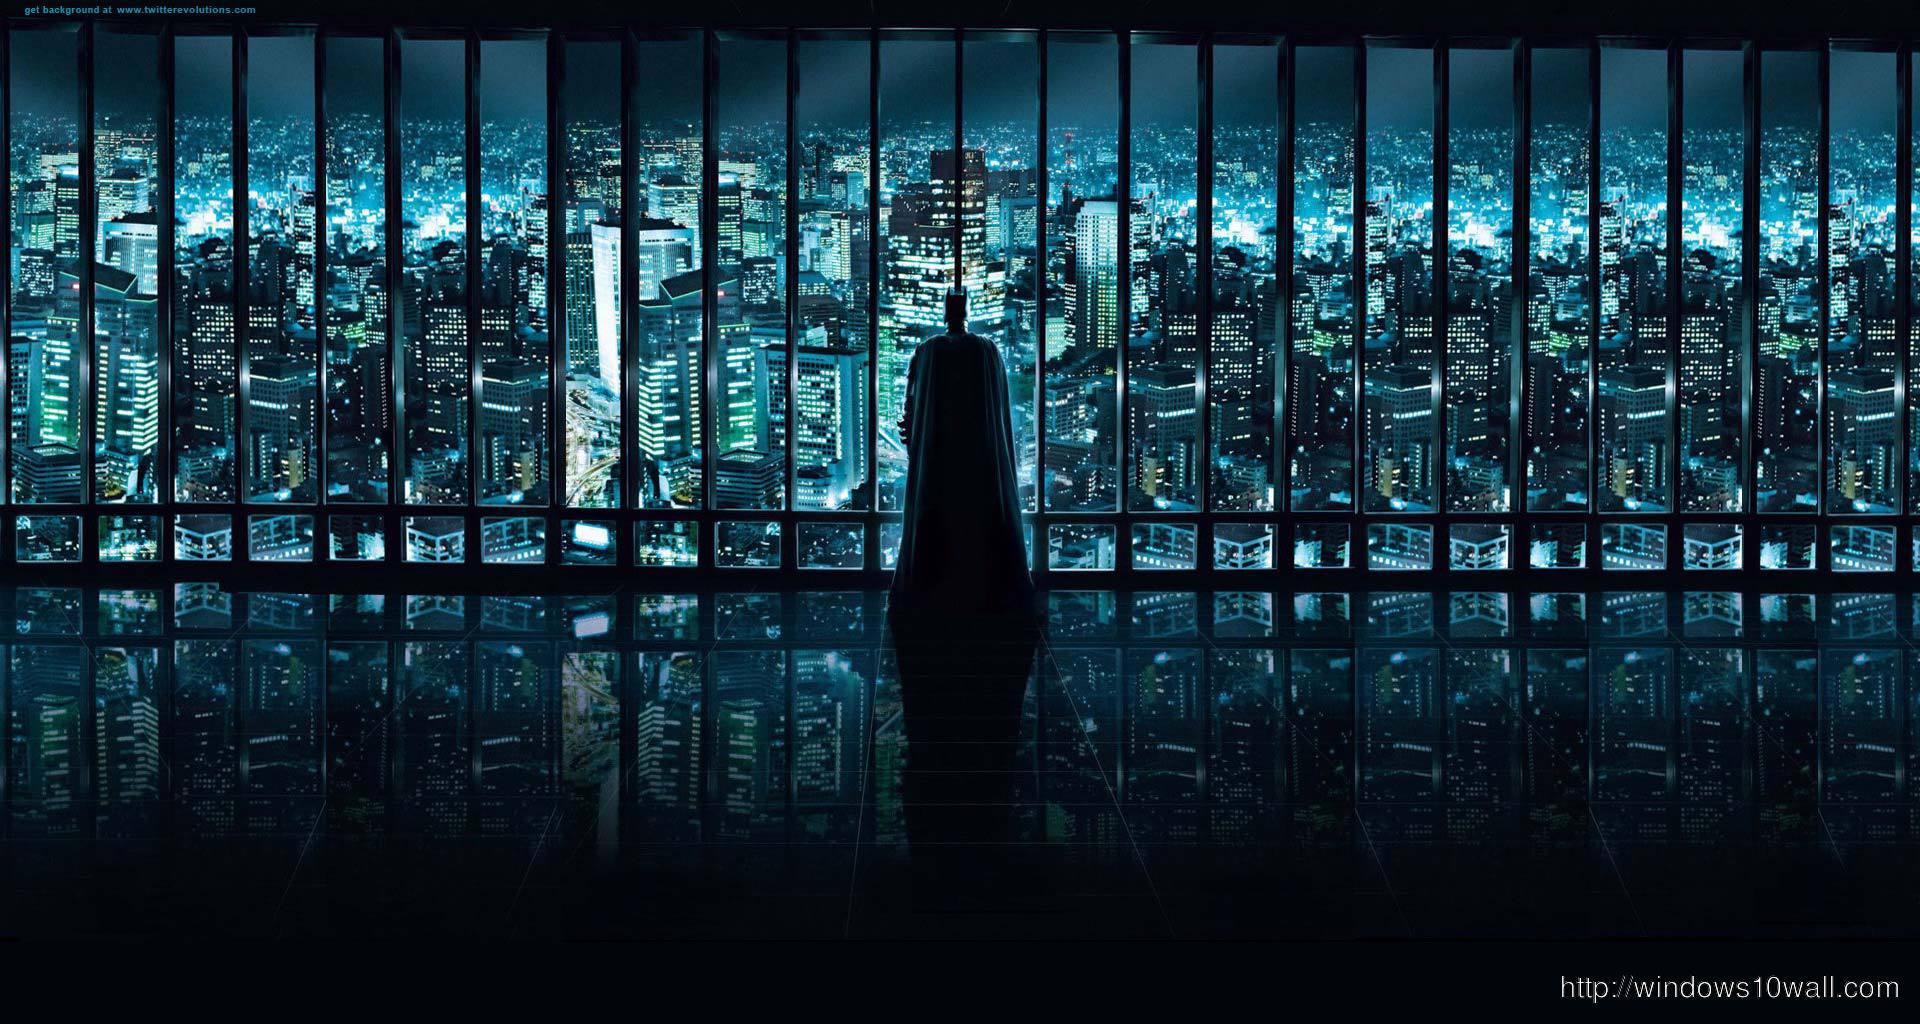 48+] Batman Wallpaper for Windows 10 on WallpaperSafari